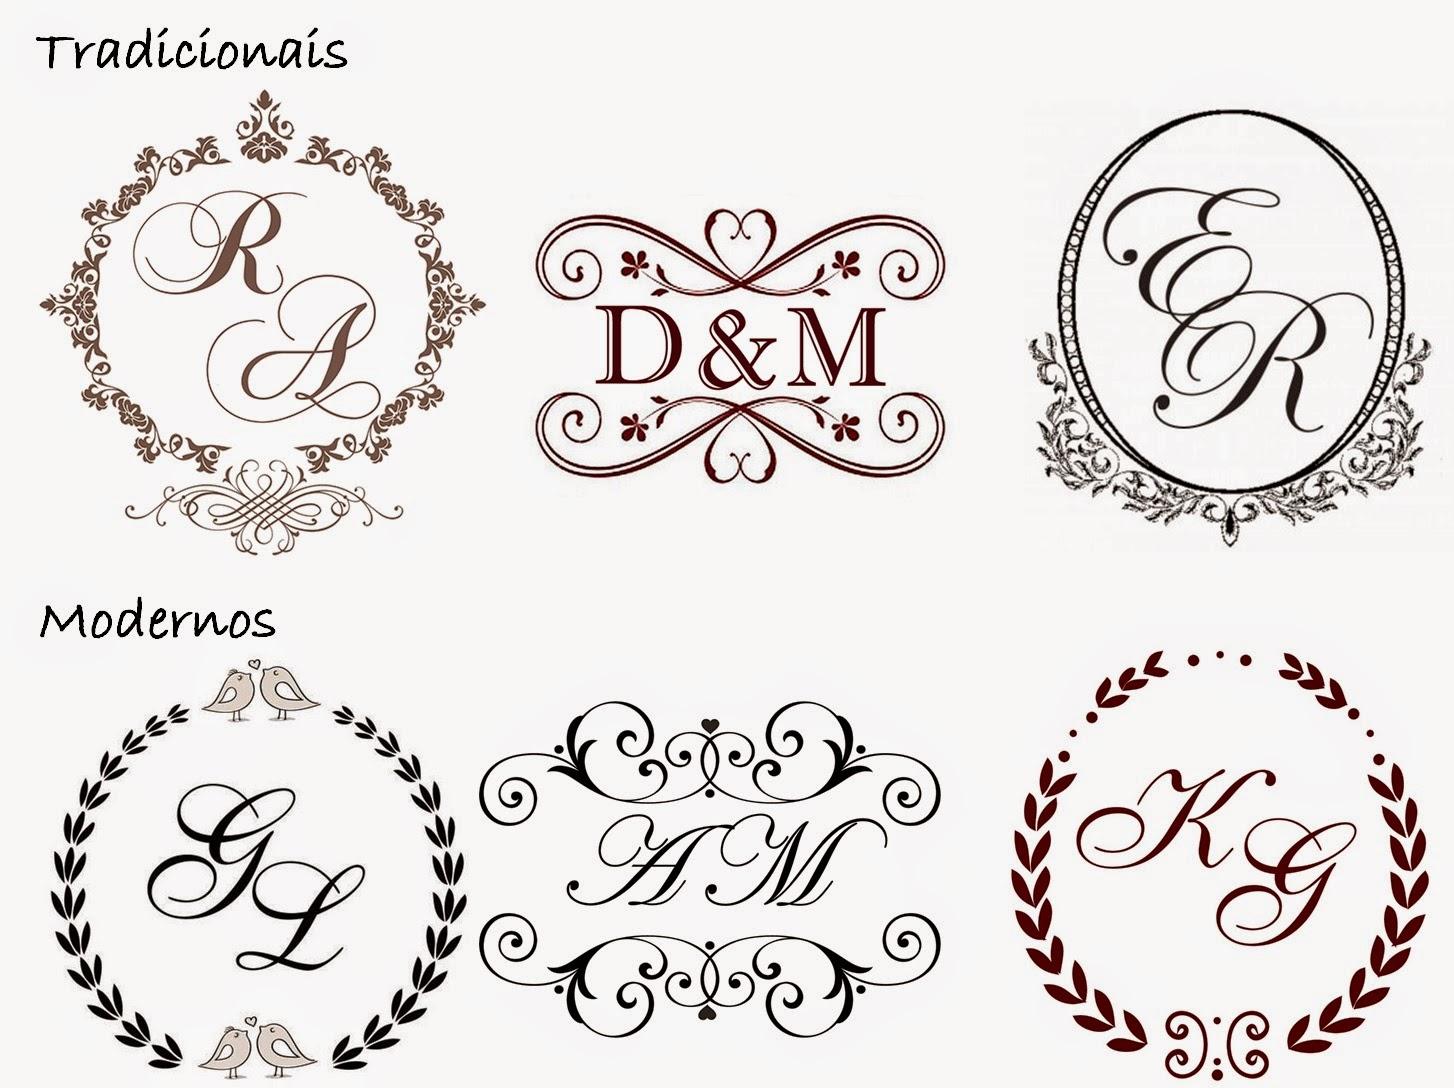 Monogramas para casamento download gr tis toda atual for C m r bagnolet